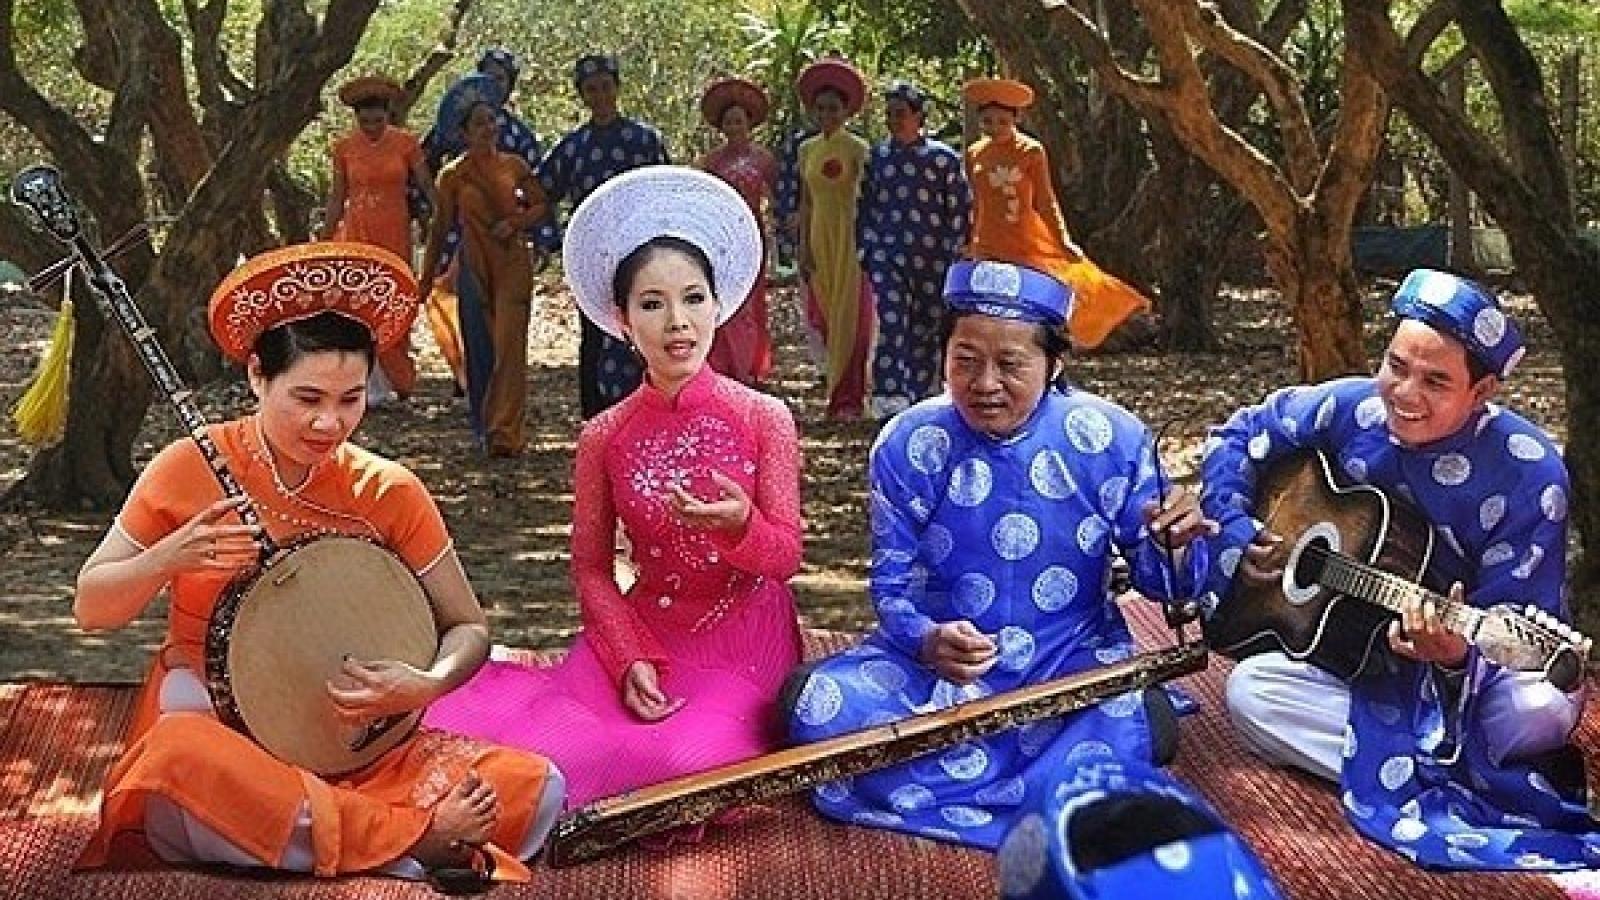 Southern folk music festival held